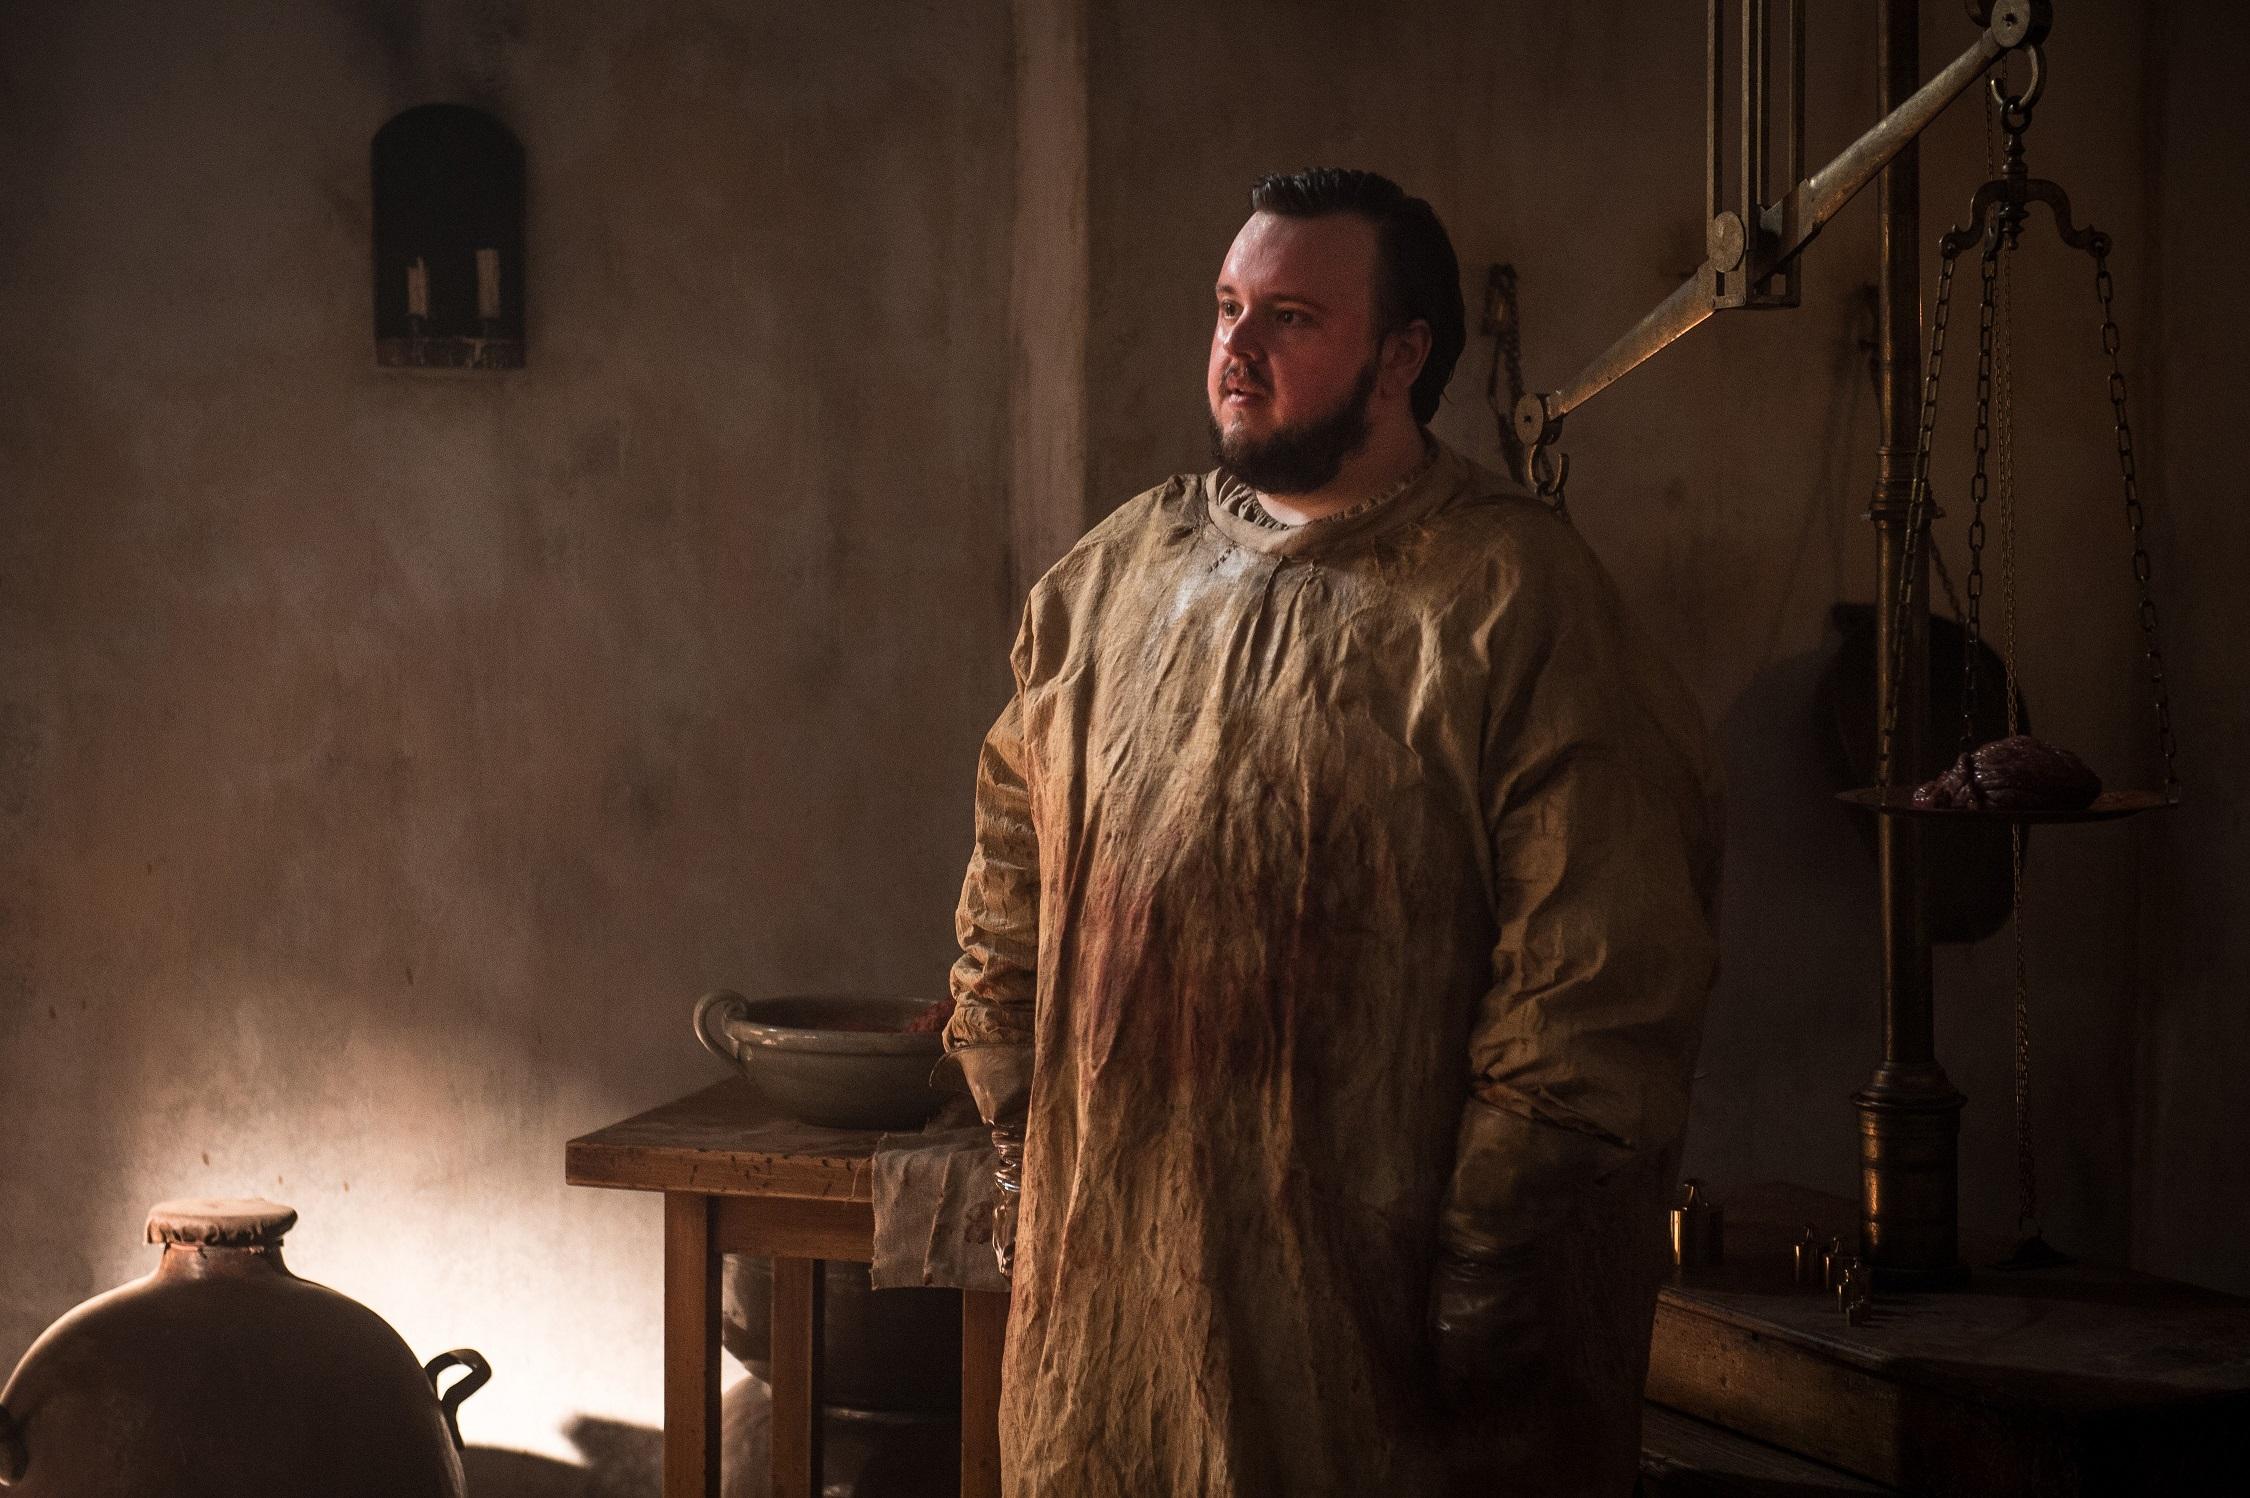 John Bradley as Samwell Tarly, bloody, at the Citadel. Photo: HBO